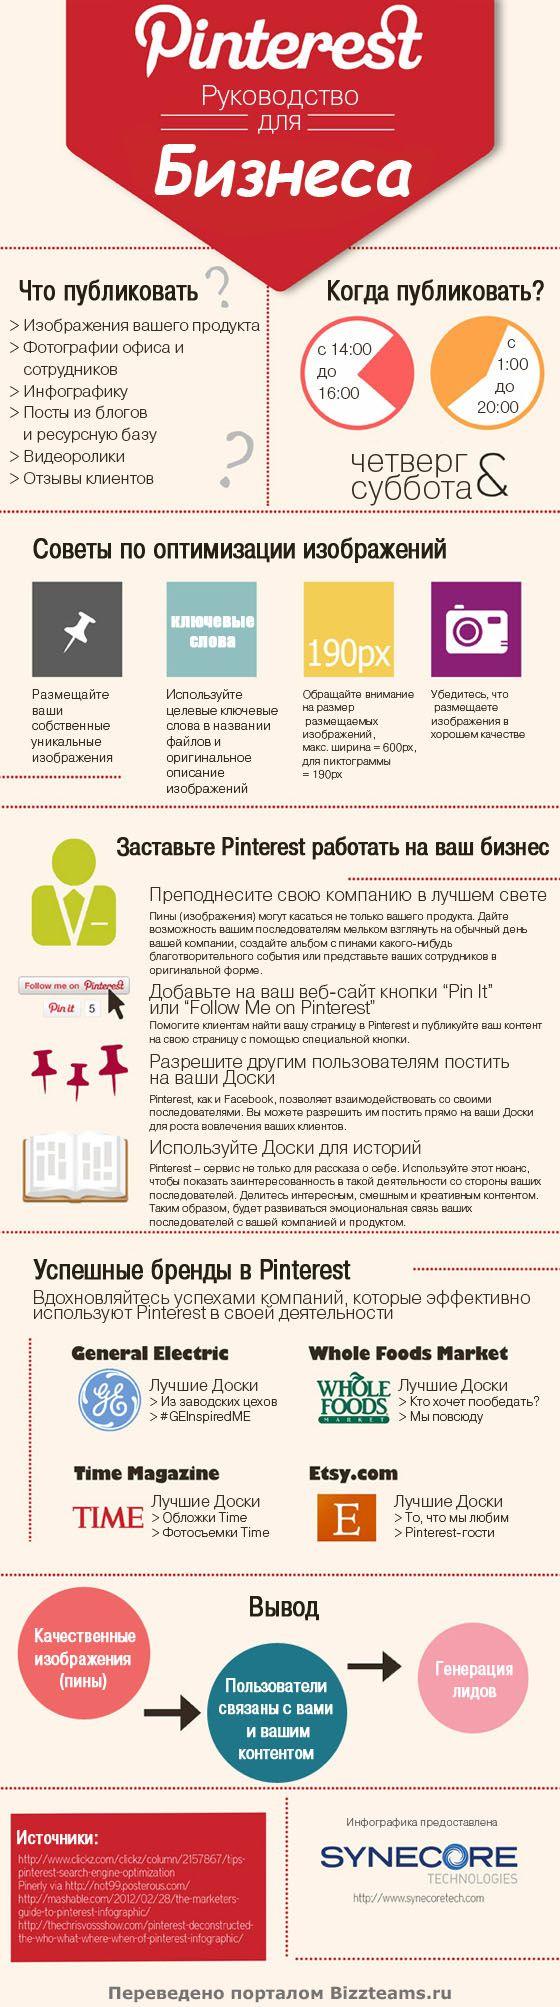 Pinterest для бизнеса | 5coins